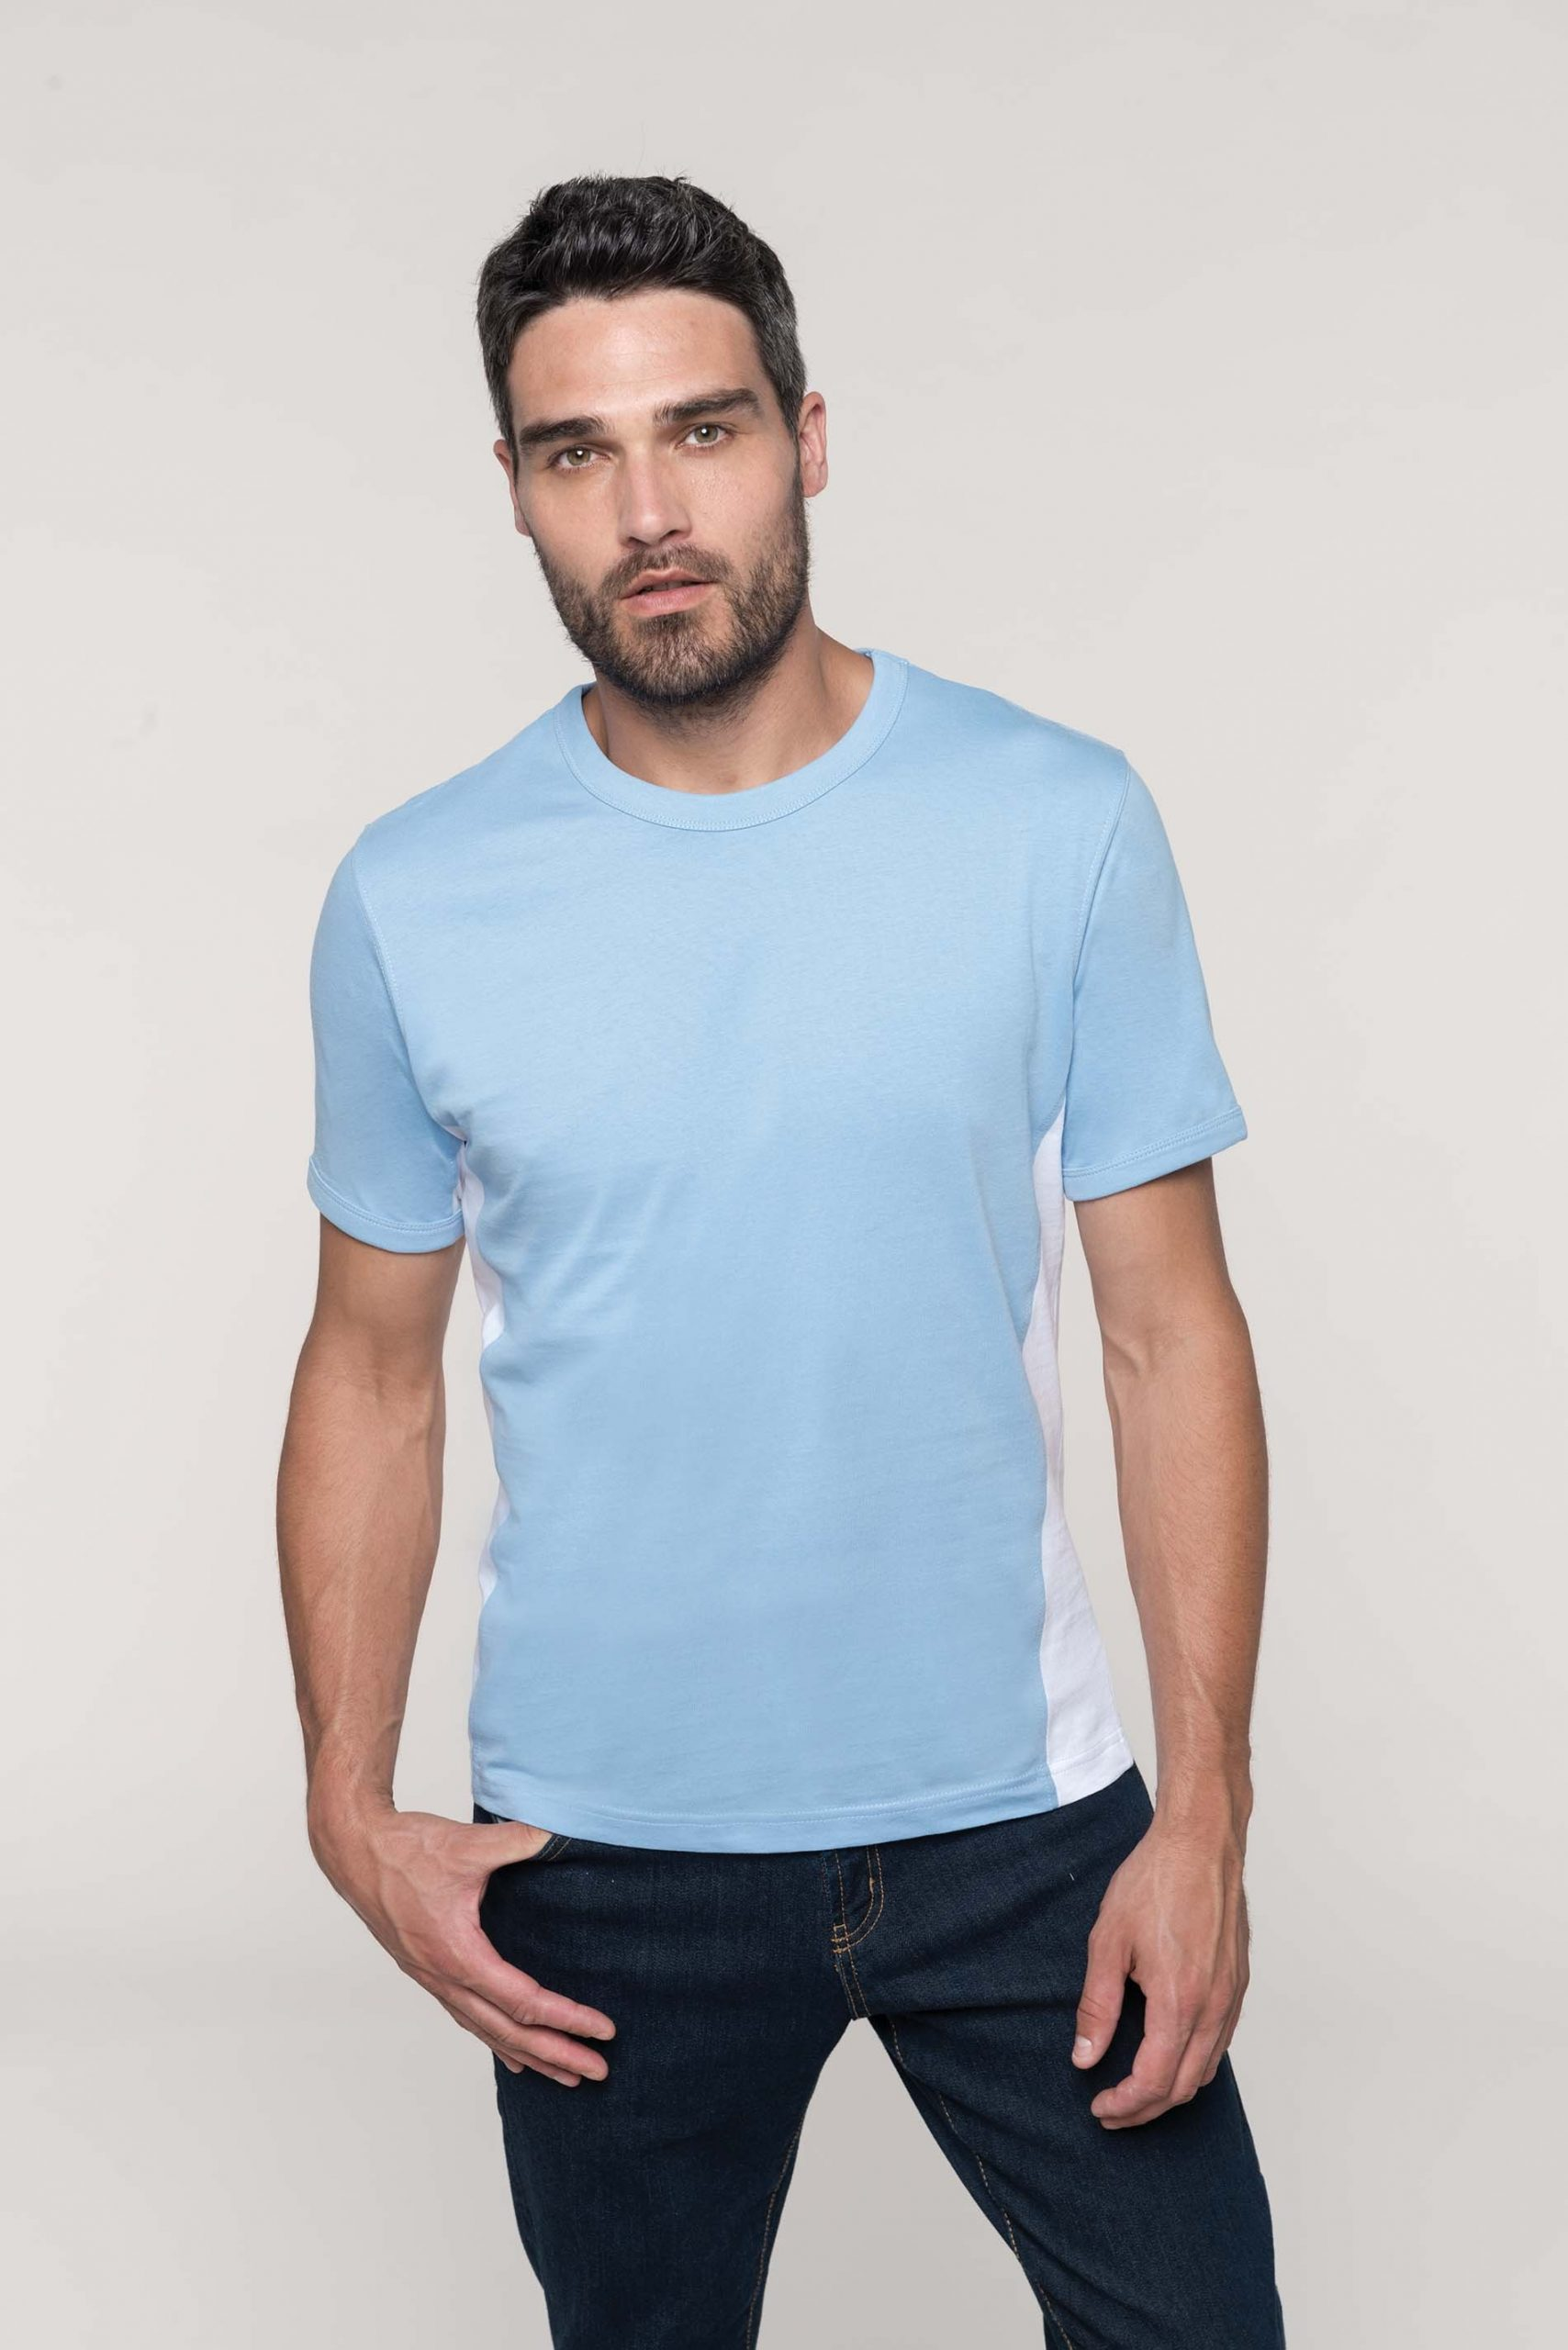 Tiger - Short Sleeve Bi-colour T-shirt Unisex